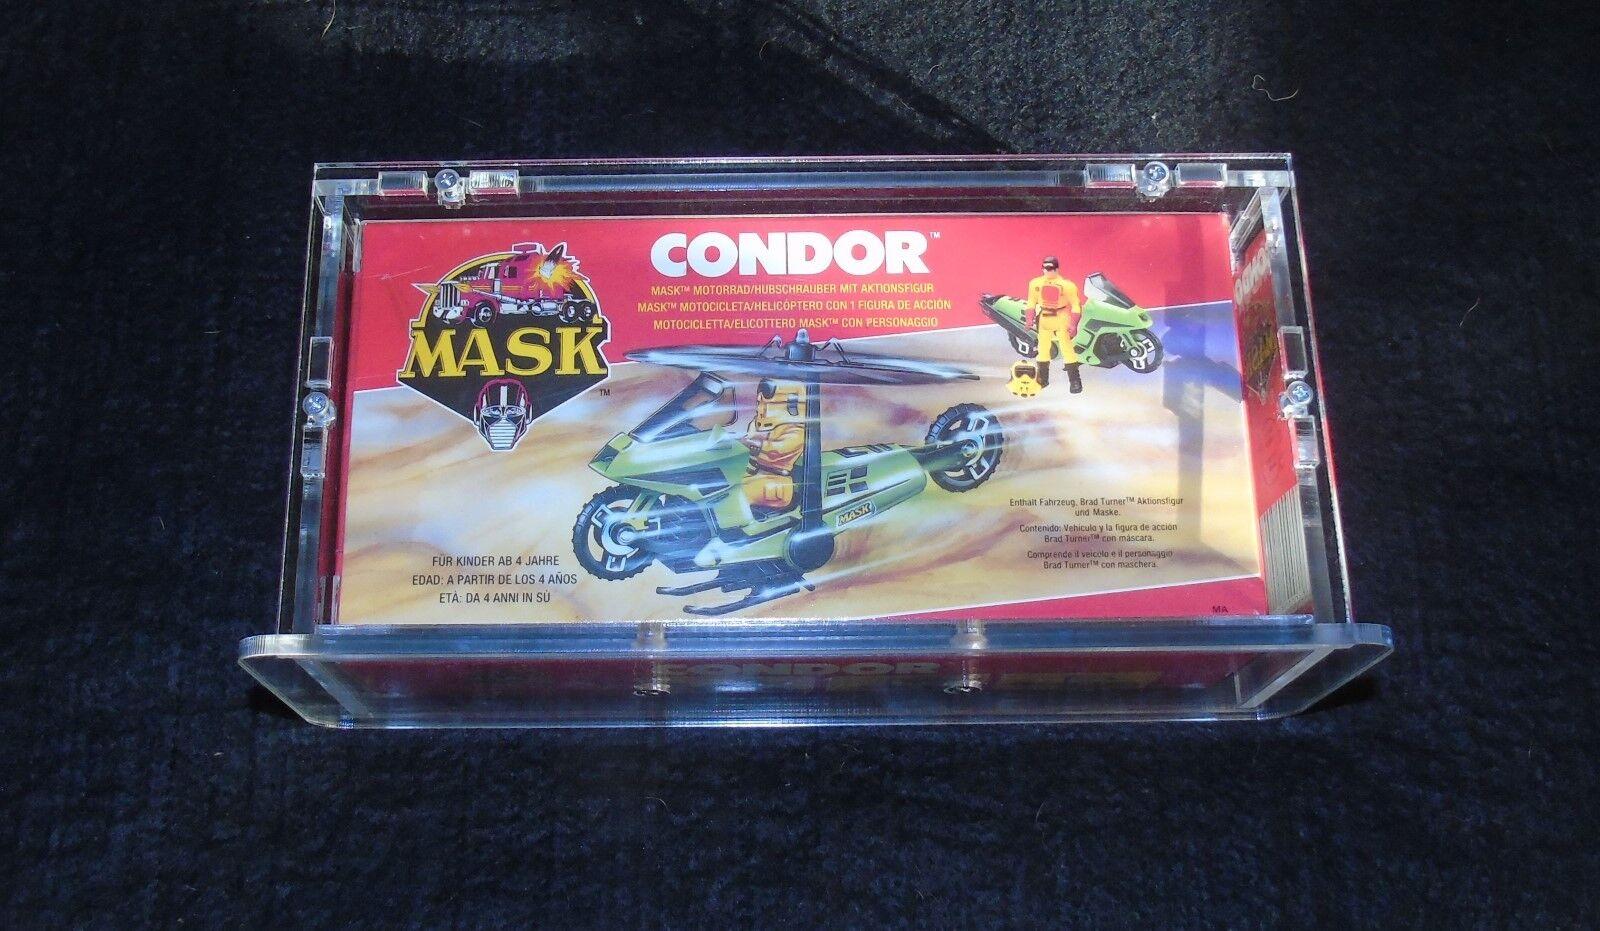 Kenner m.a.s.k. condor maske europäischen mib - gift unusued sora - fall